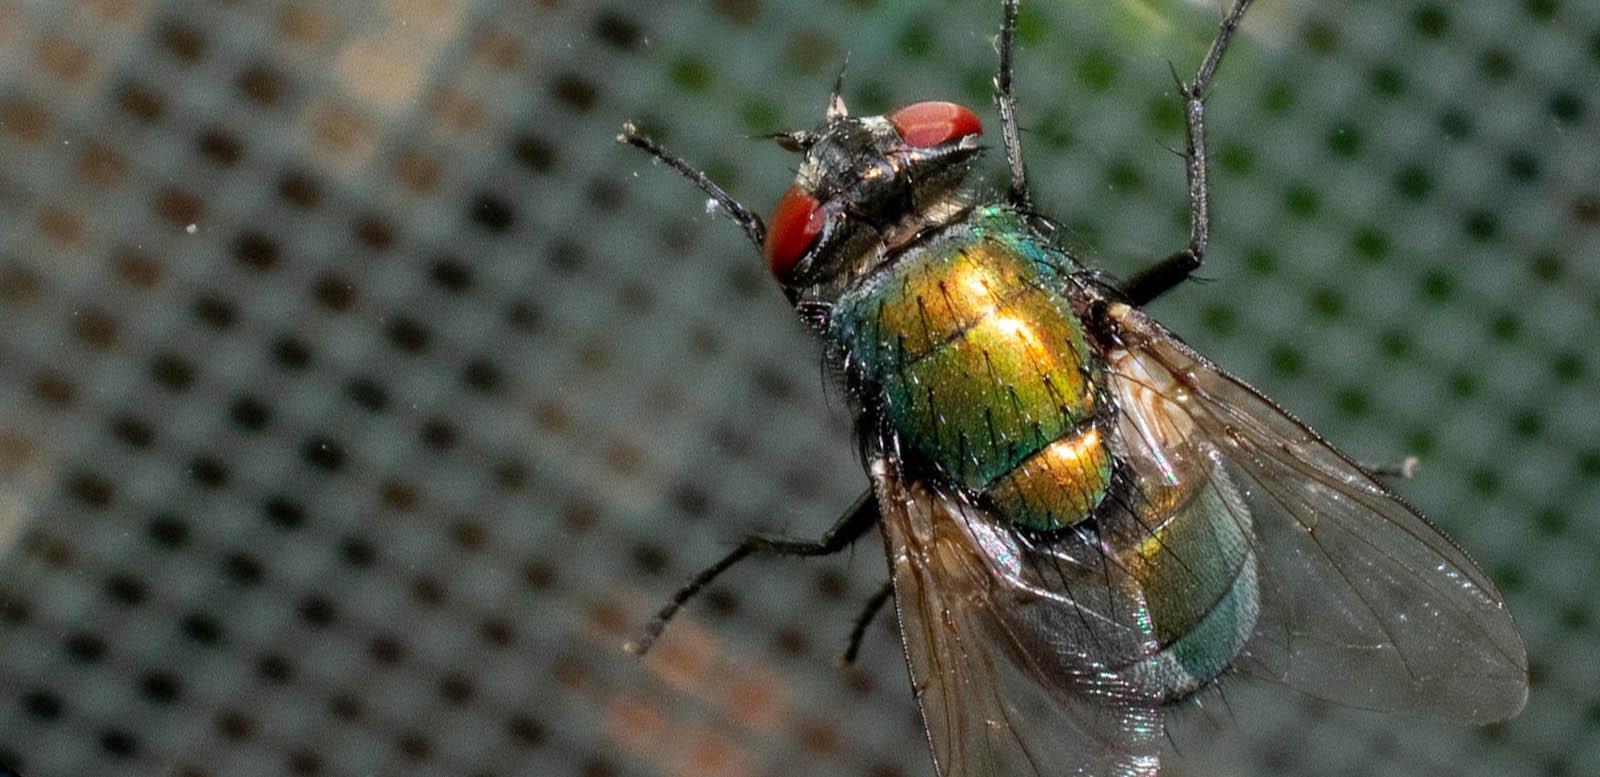 fly pest control in Essex & Suffolk